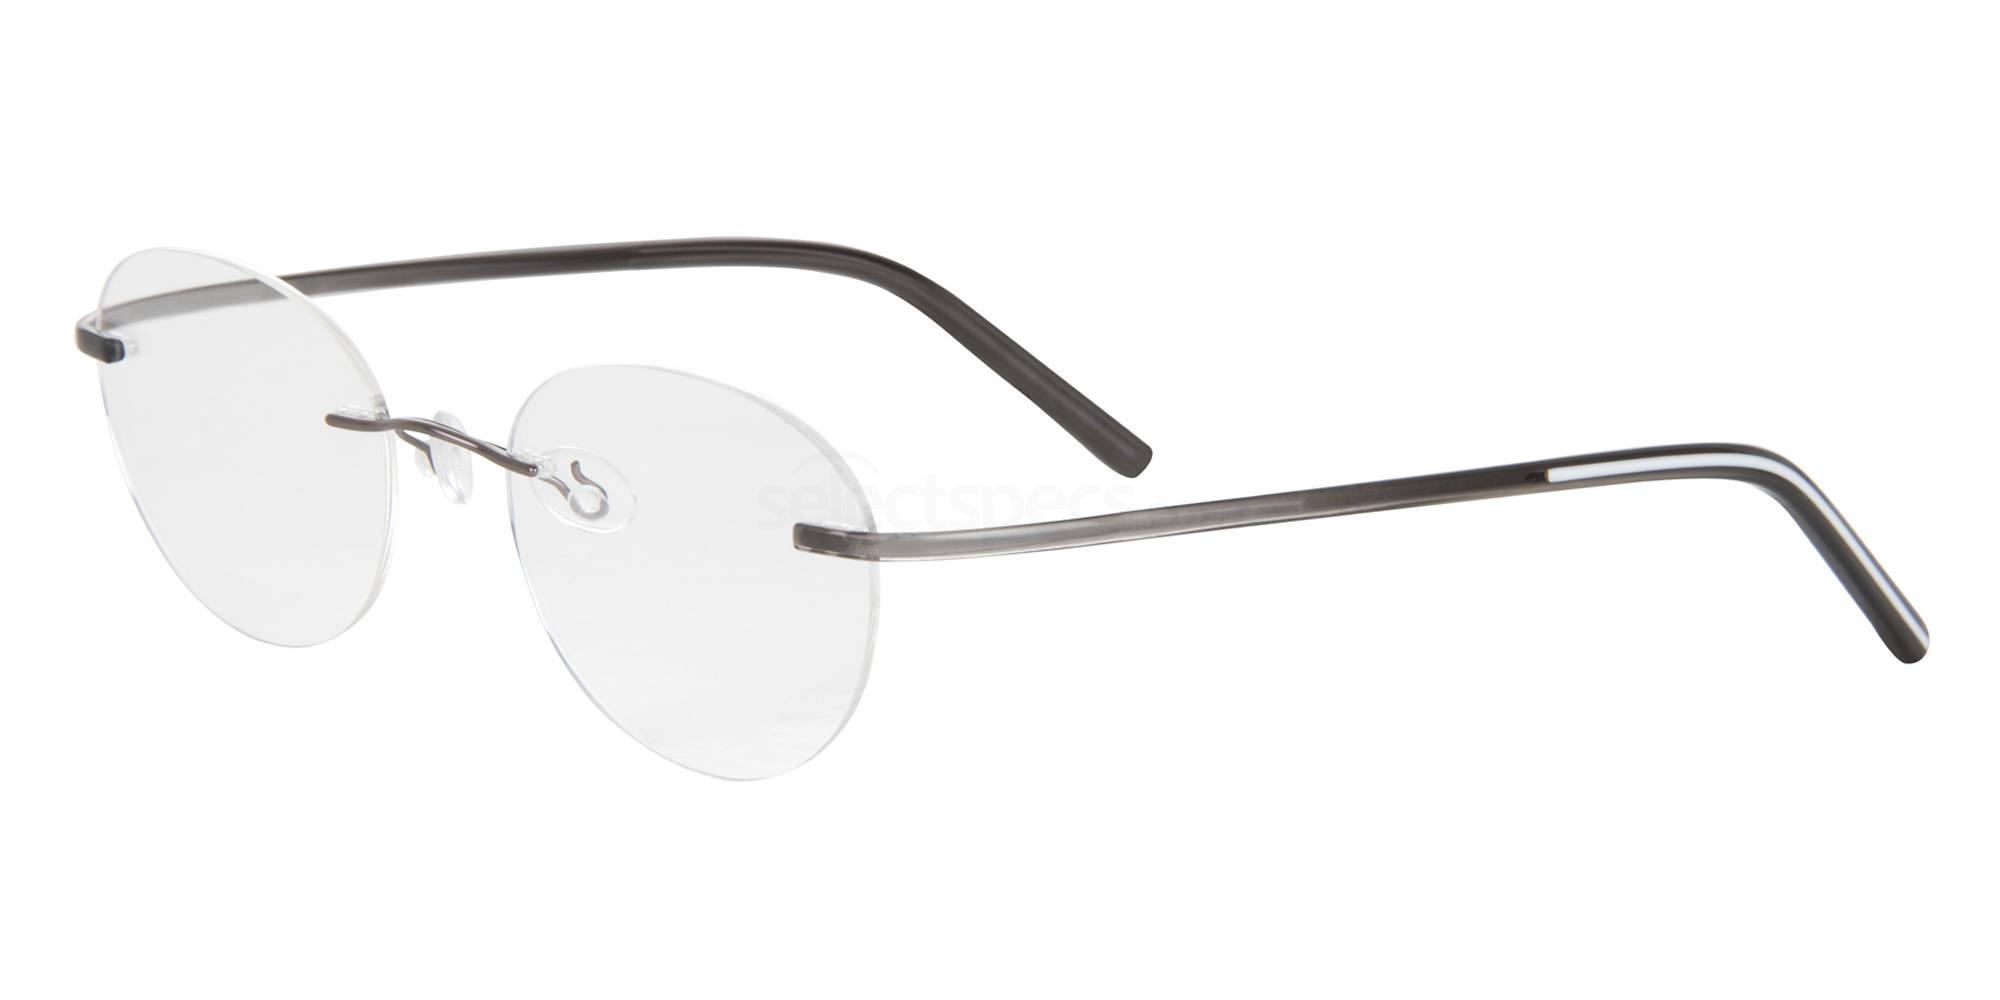 035 ENERGY 204 Glasses, AIRLOCK